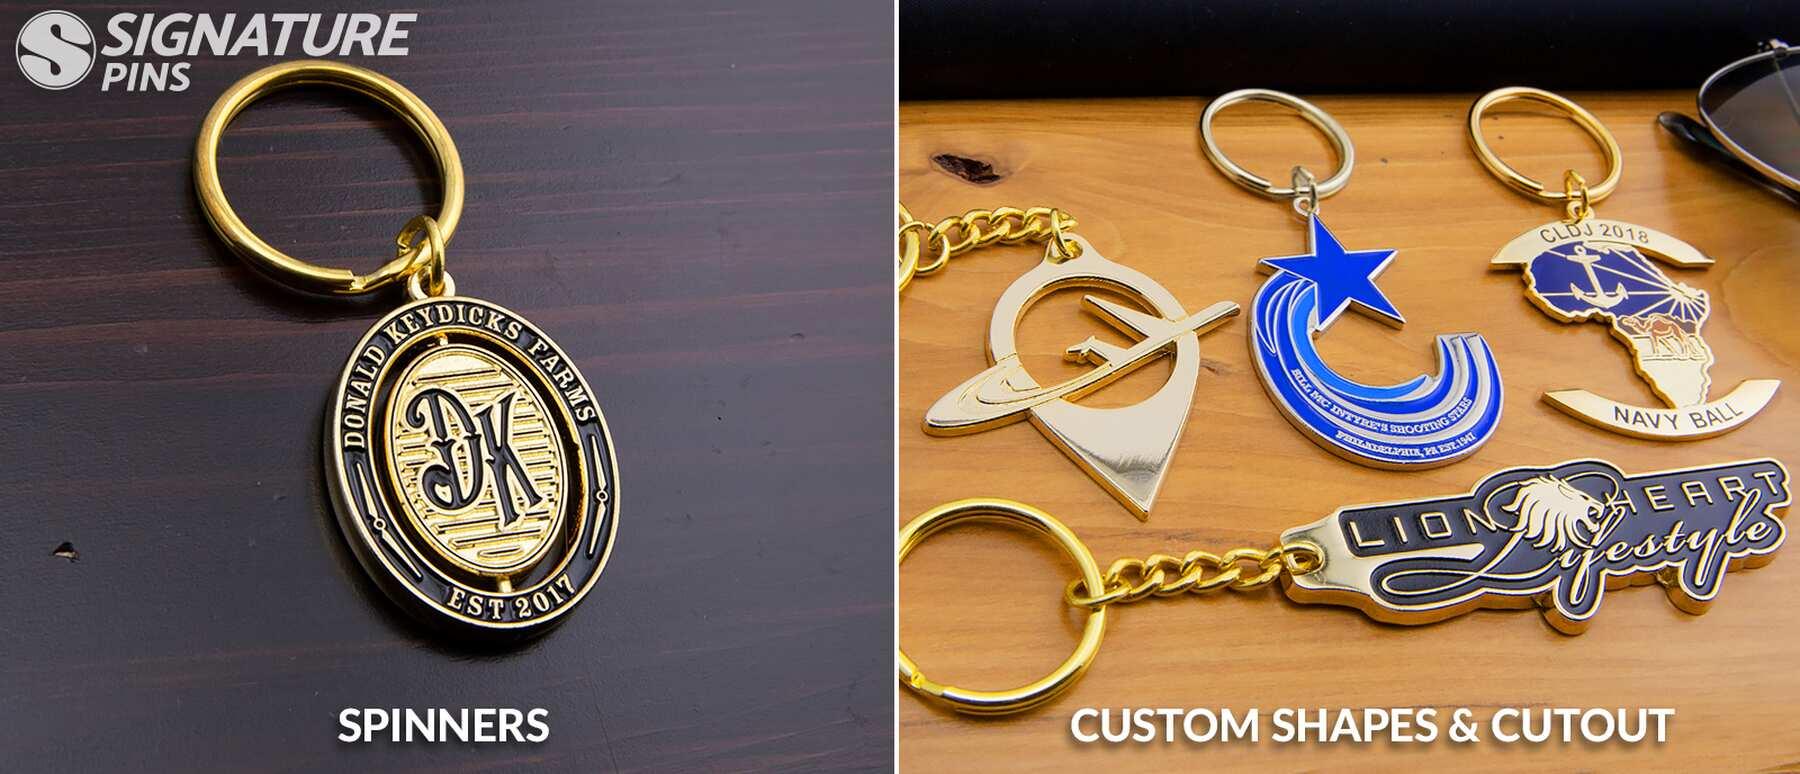 Signature-Pins-Custom-Shapes-Keychain-Spinner-Keychain